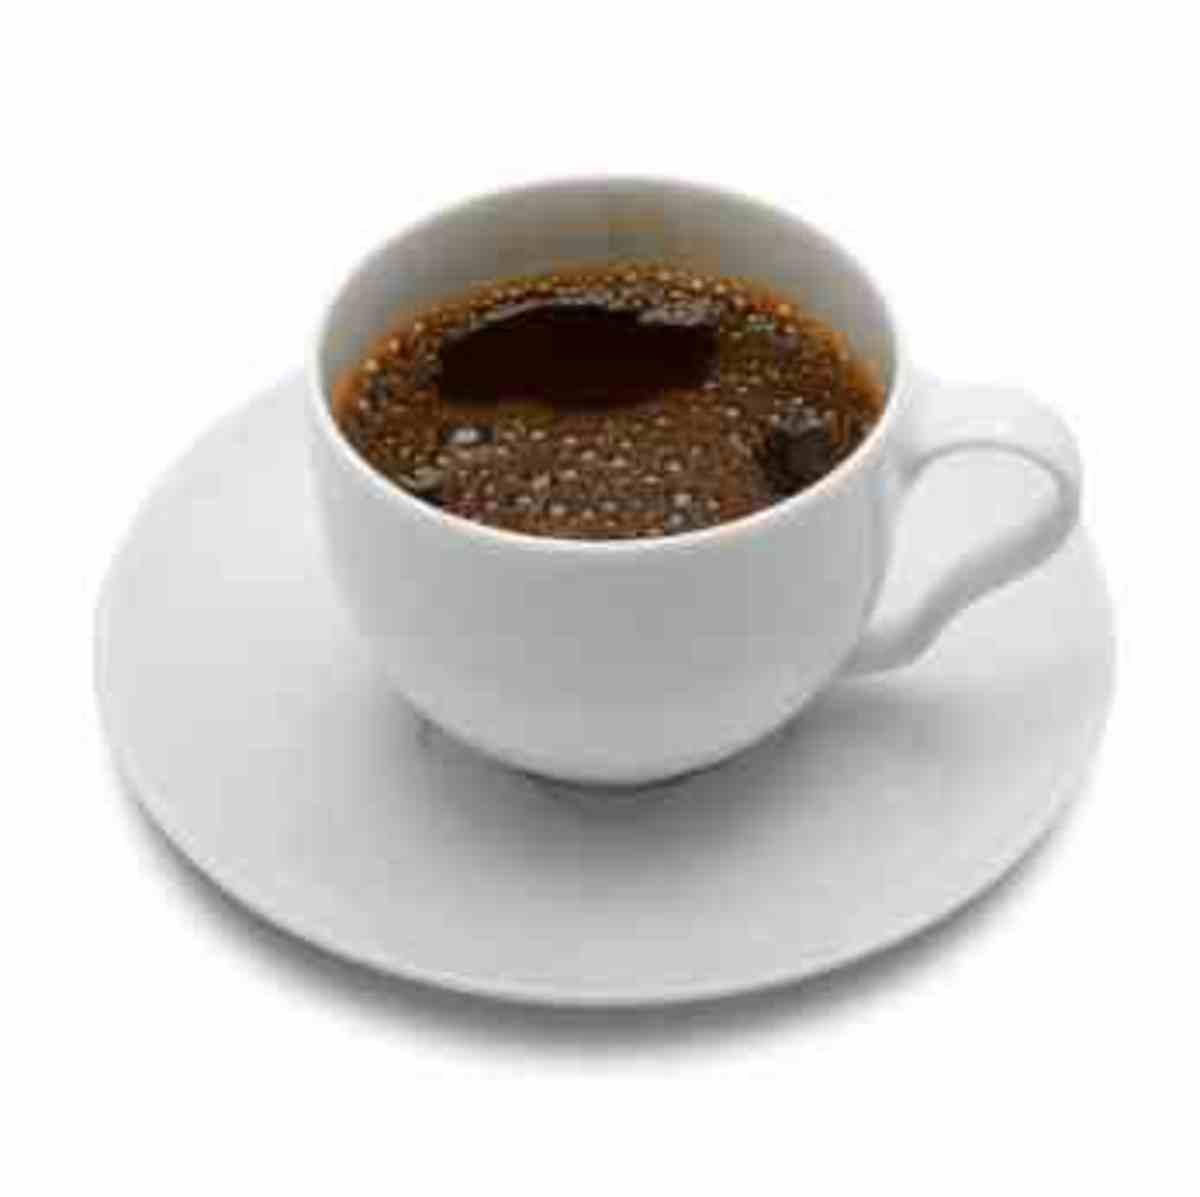 Coffee! Yum! Flickr.